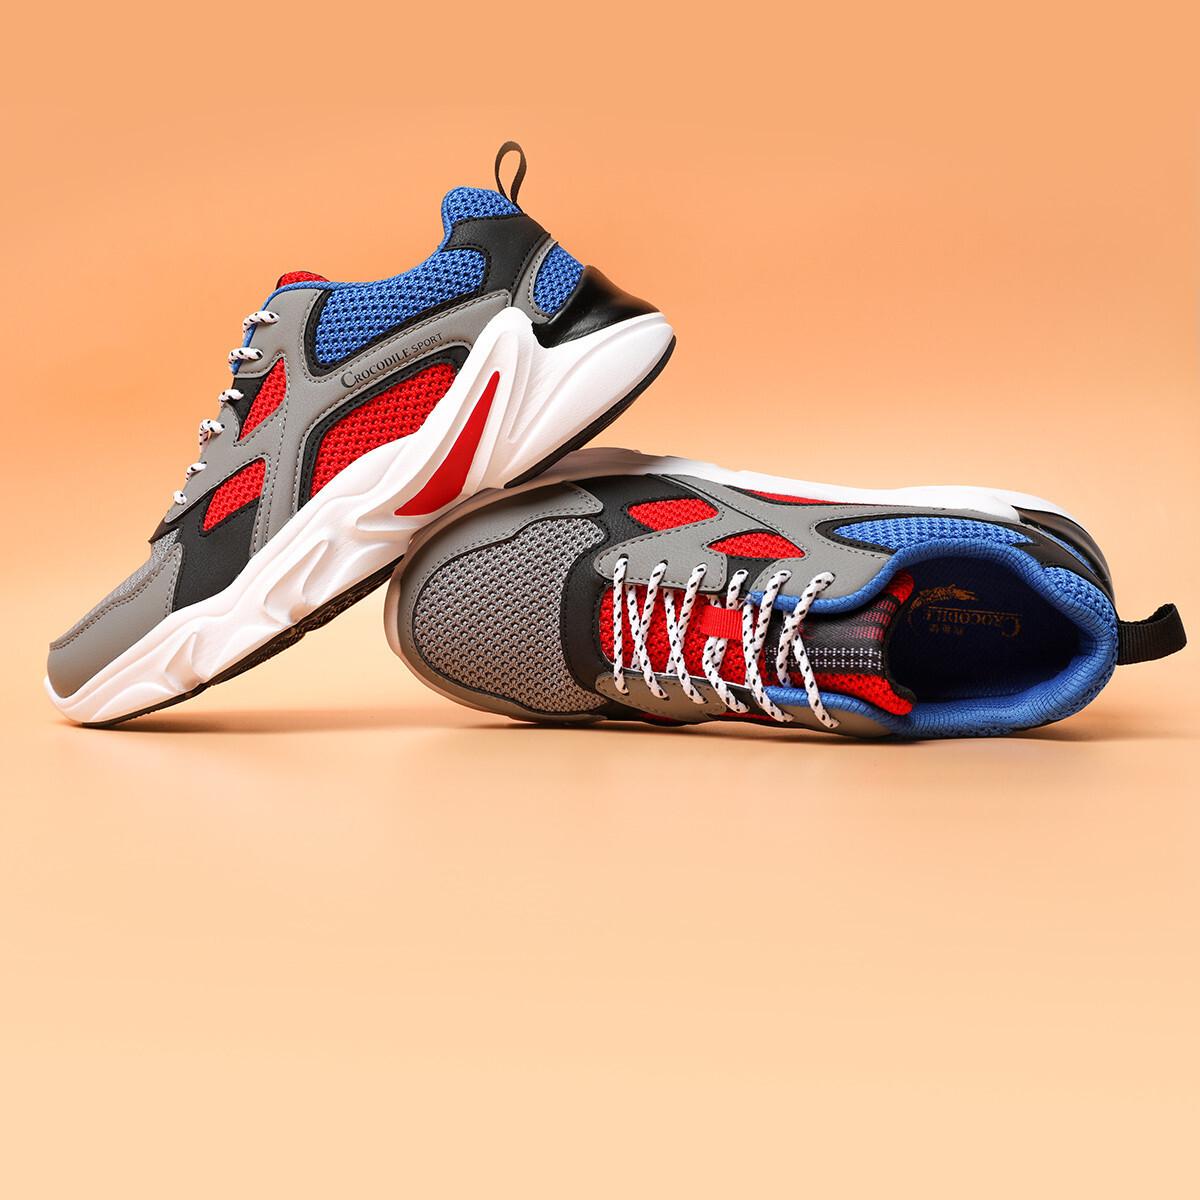 Marathon Fabric Weaving Light footwear